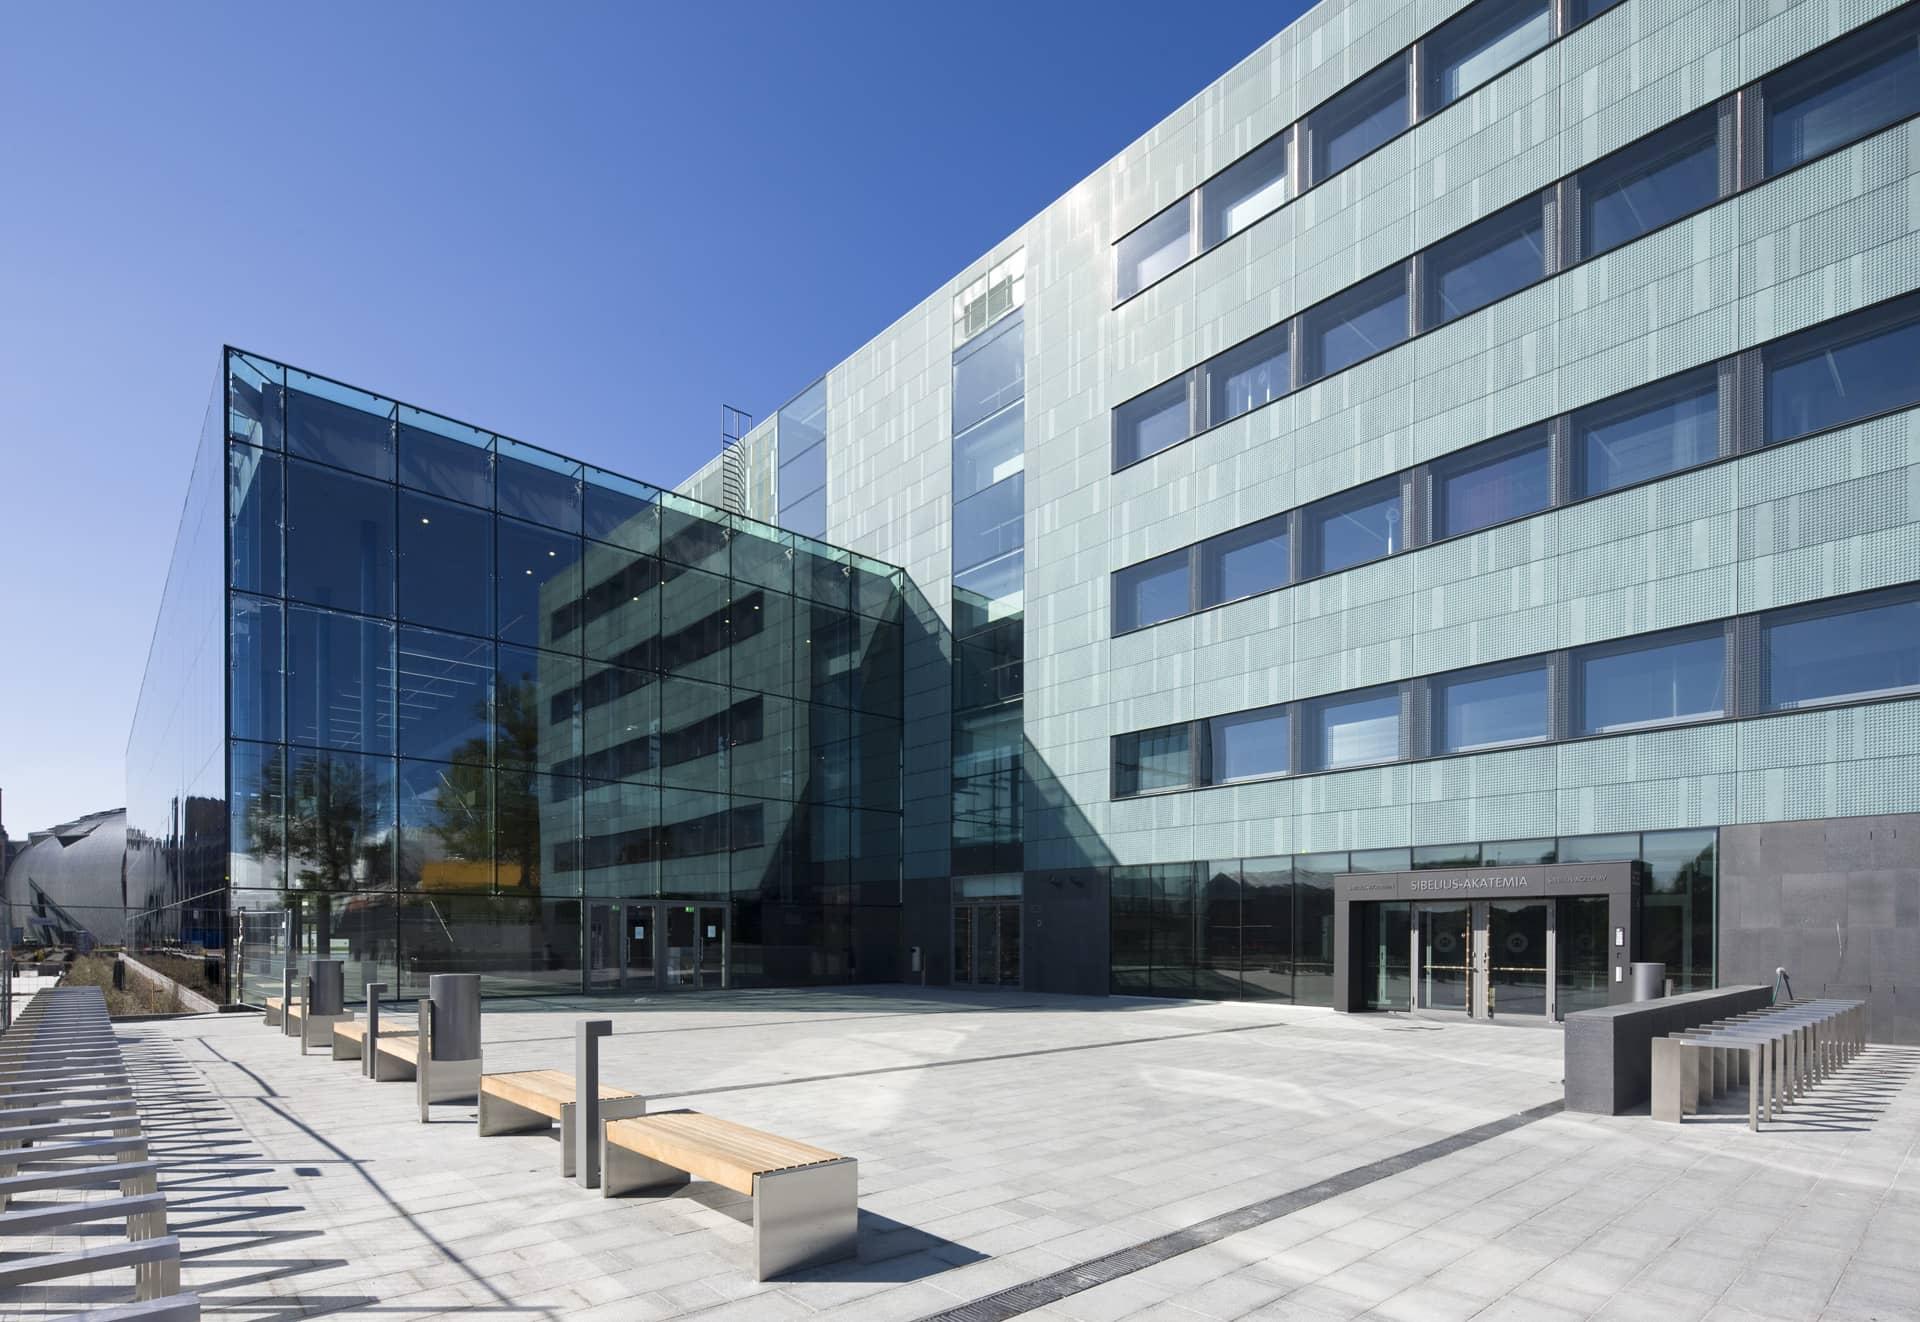 Helsinki Music Centre | LPR-arkkitehdit